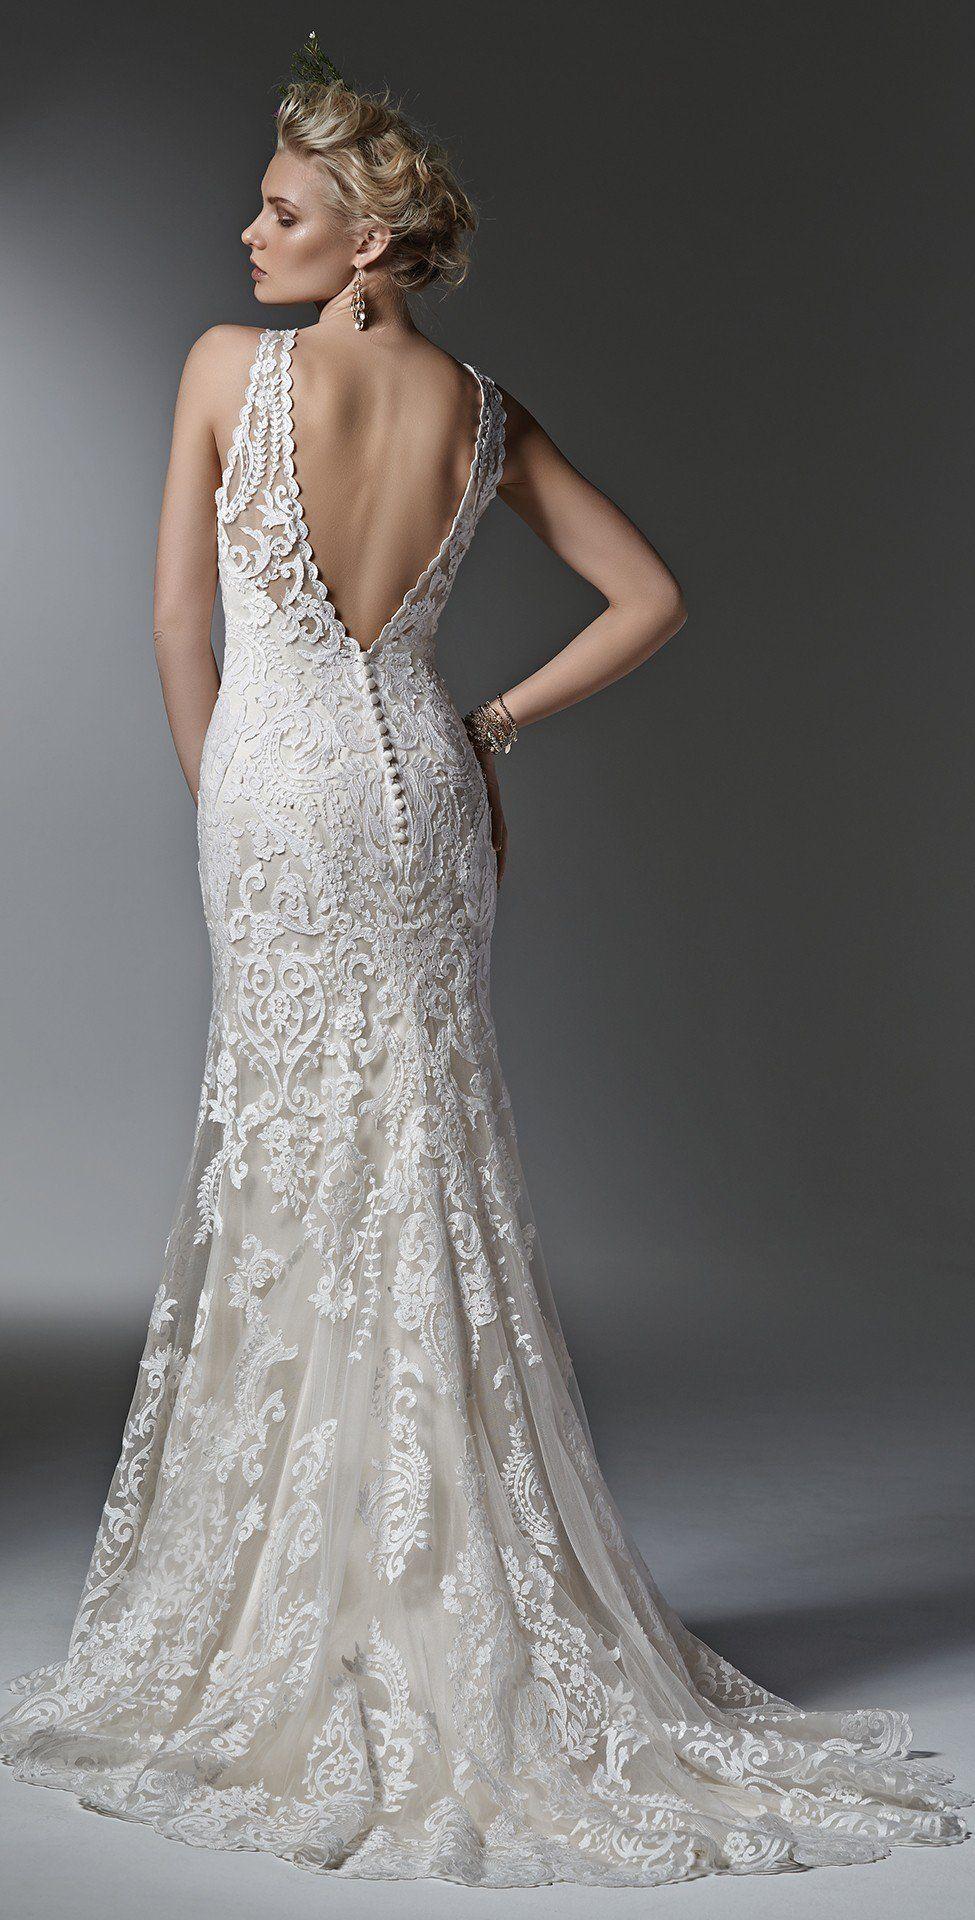 Winifred By Sottero And Midgley Wedding Dresses Sheath Wedding Dress Lace Wedding Dresses For Girls Sottero And Midgley Wedding Dresses